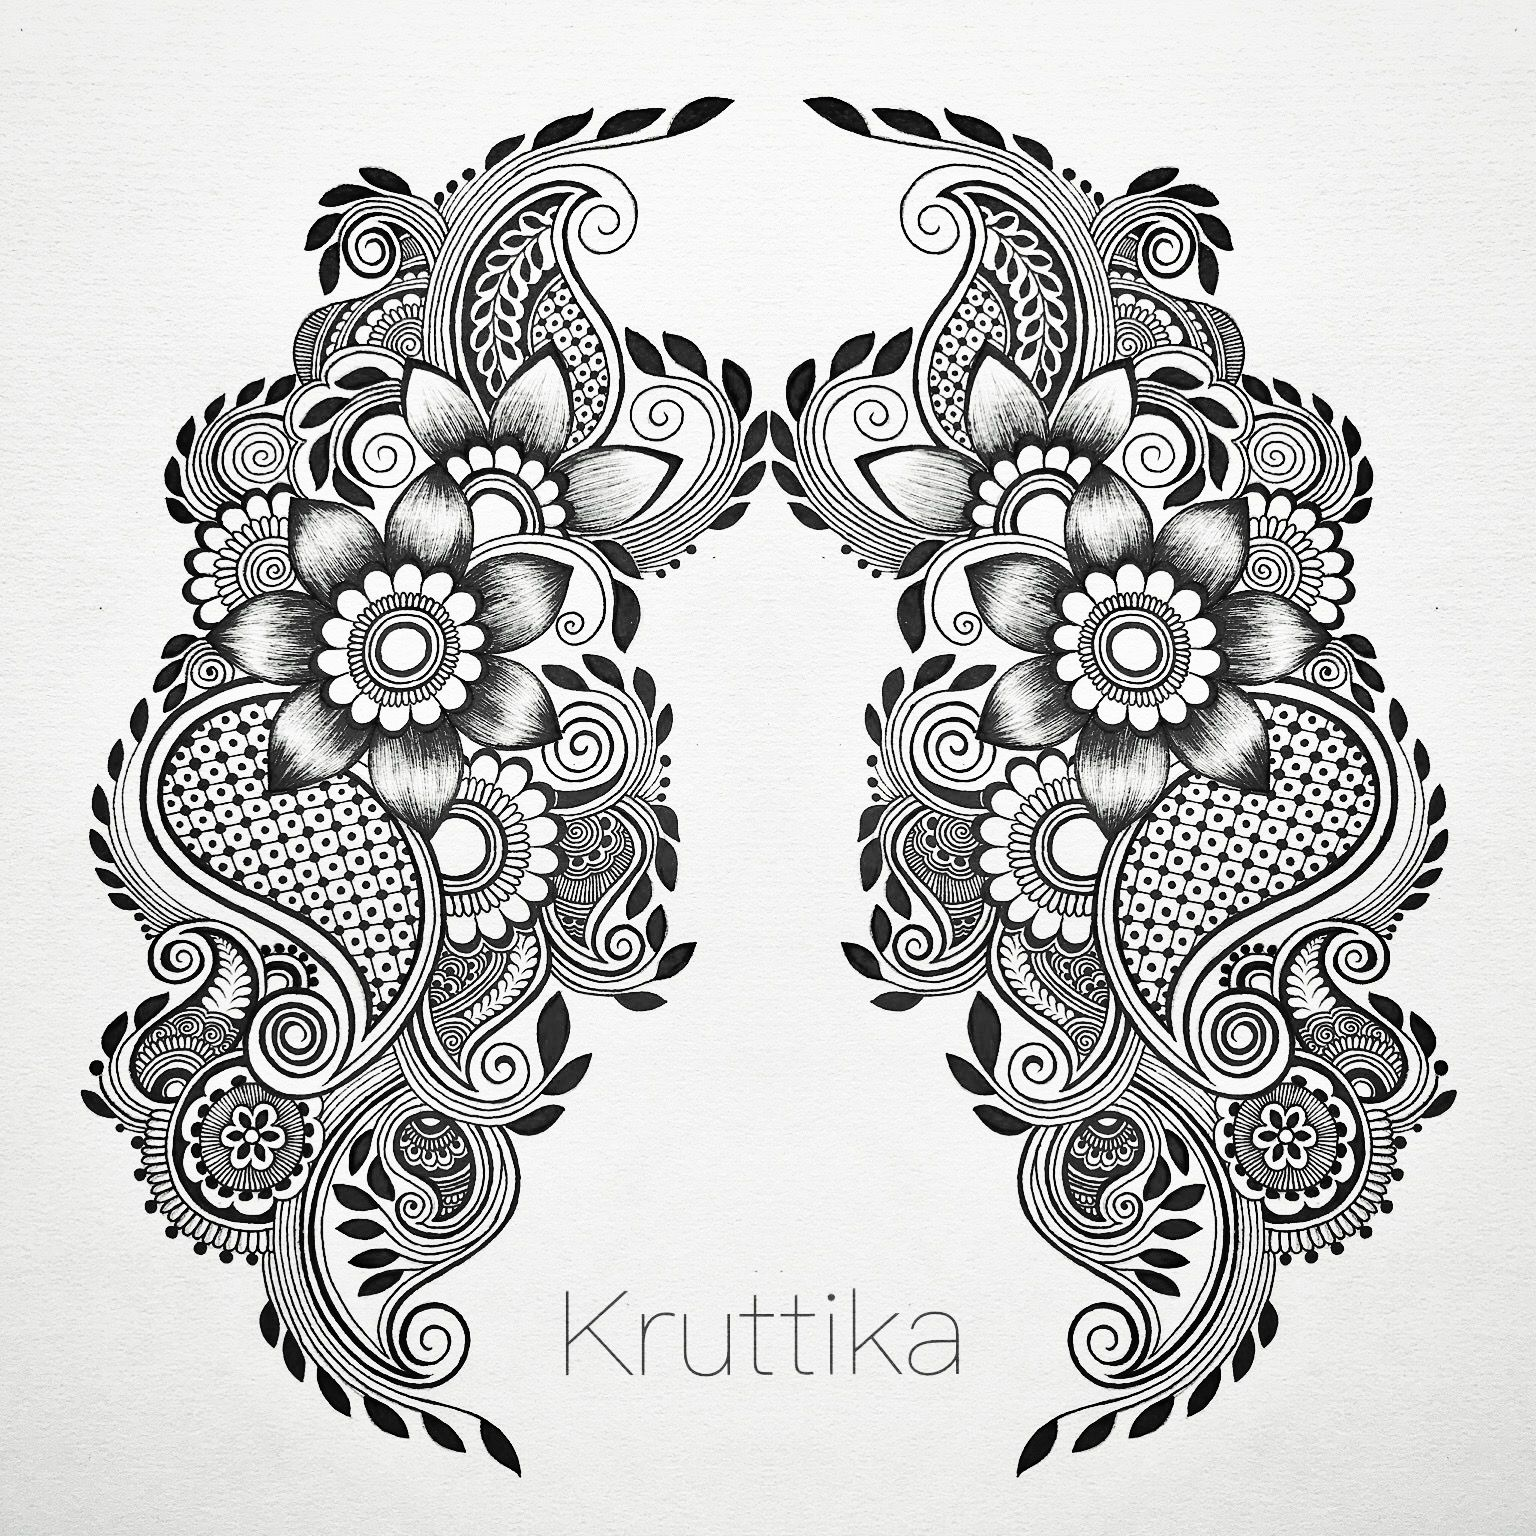 Symmetrical Drawing Designs